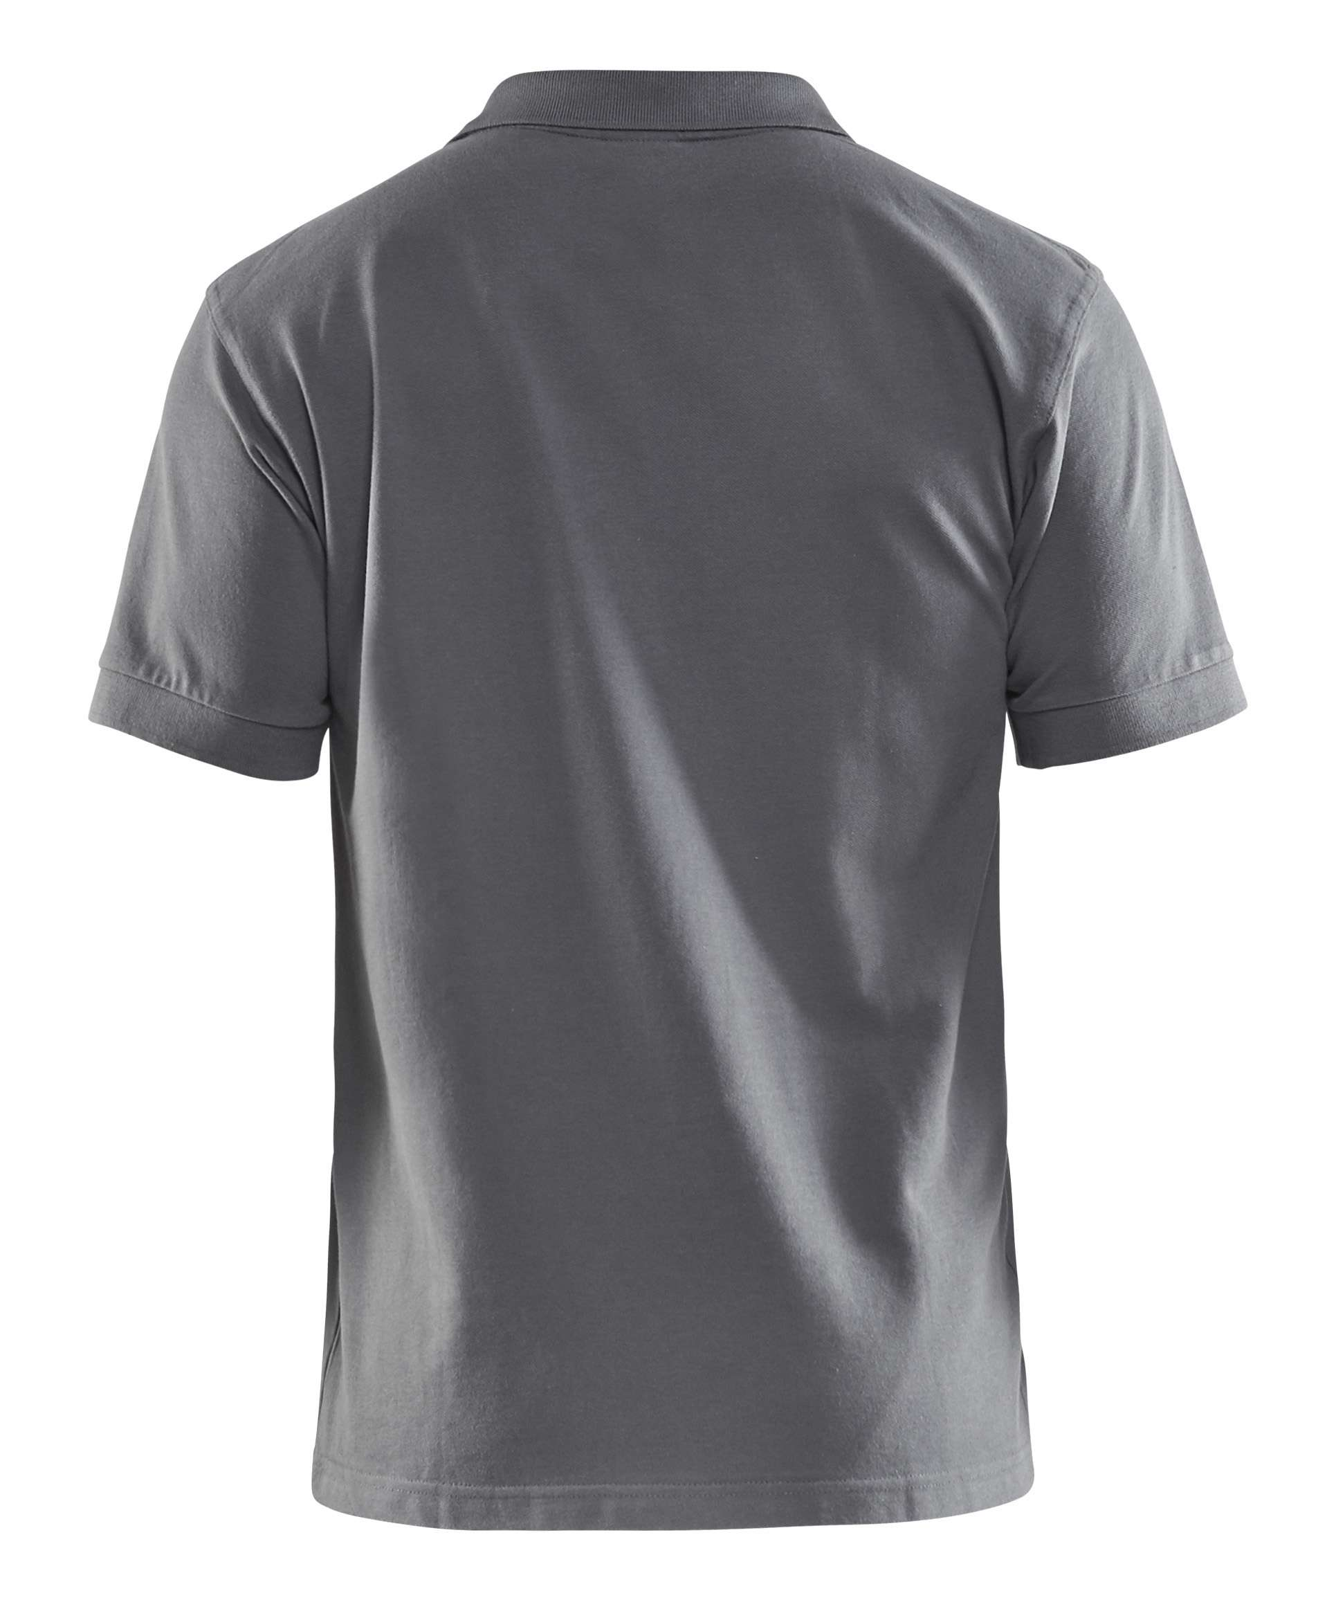 Blaklader Poloshirts 33051035 grijs(9400)